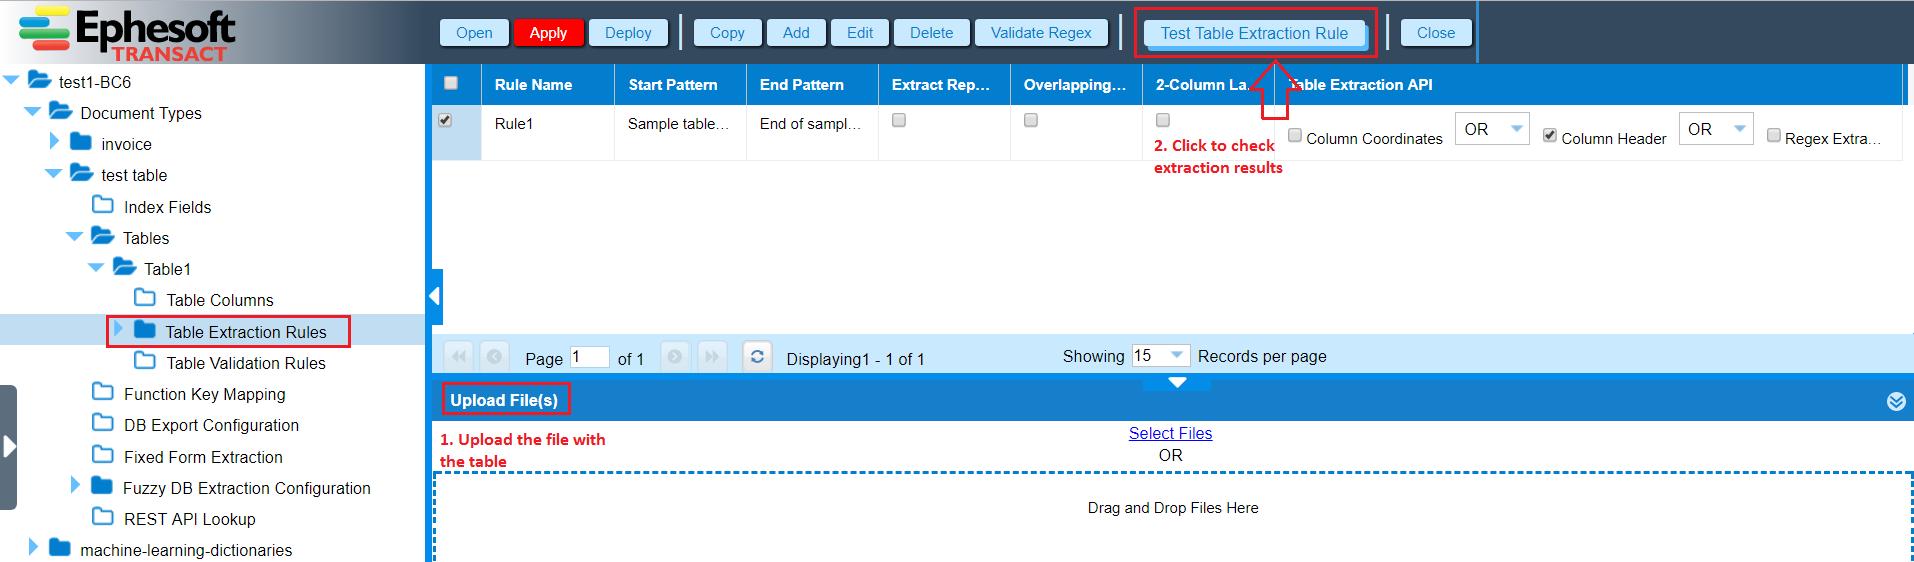 C:\Users\Ephesoft\AppData\Local\Microsoft\Windows\INetCache\Content.Word\8.png